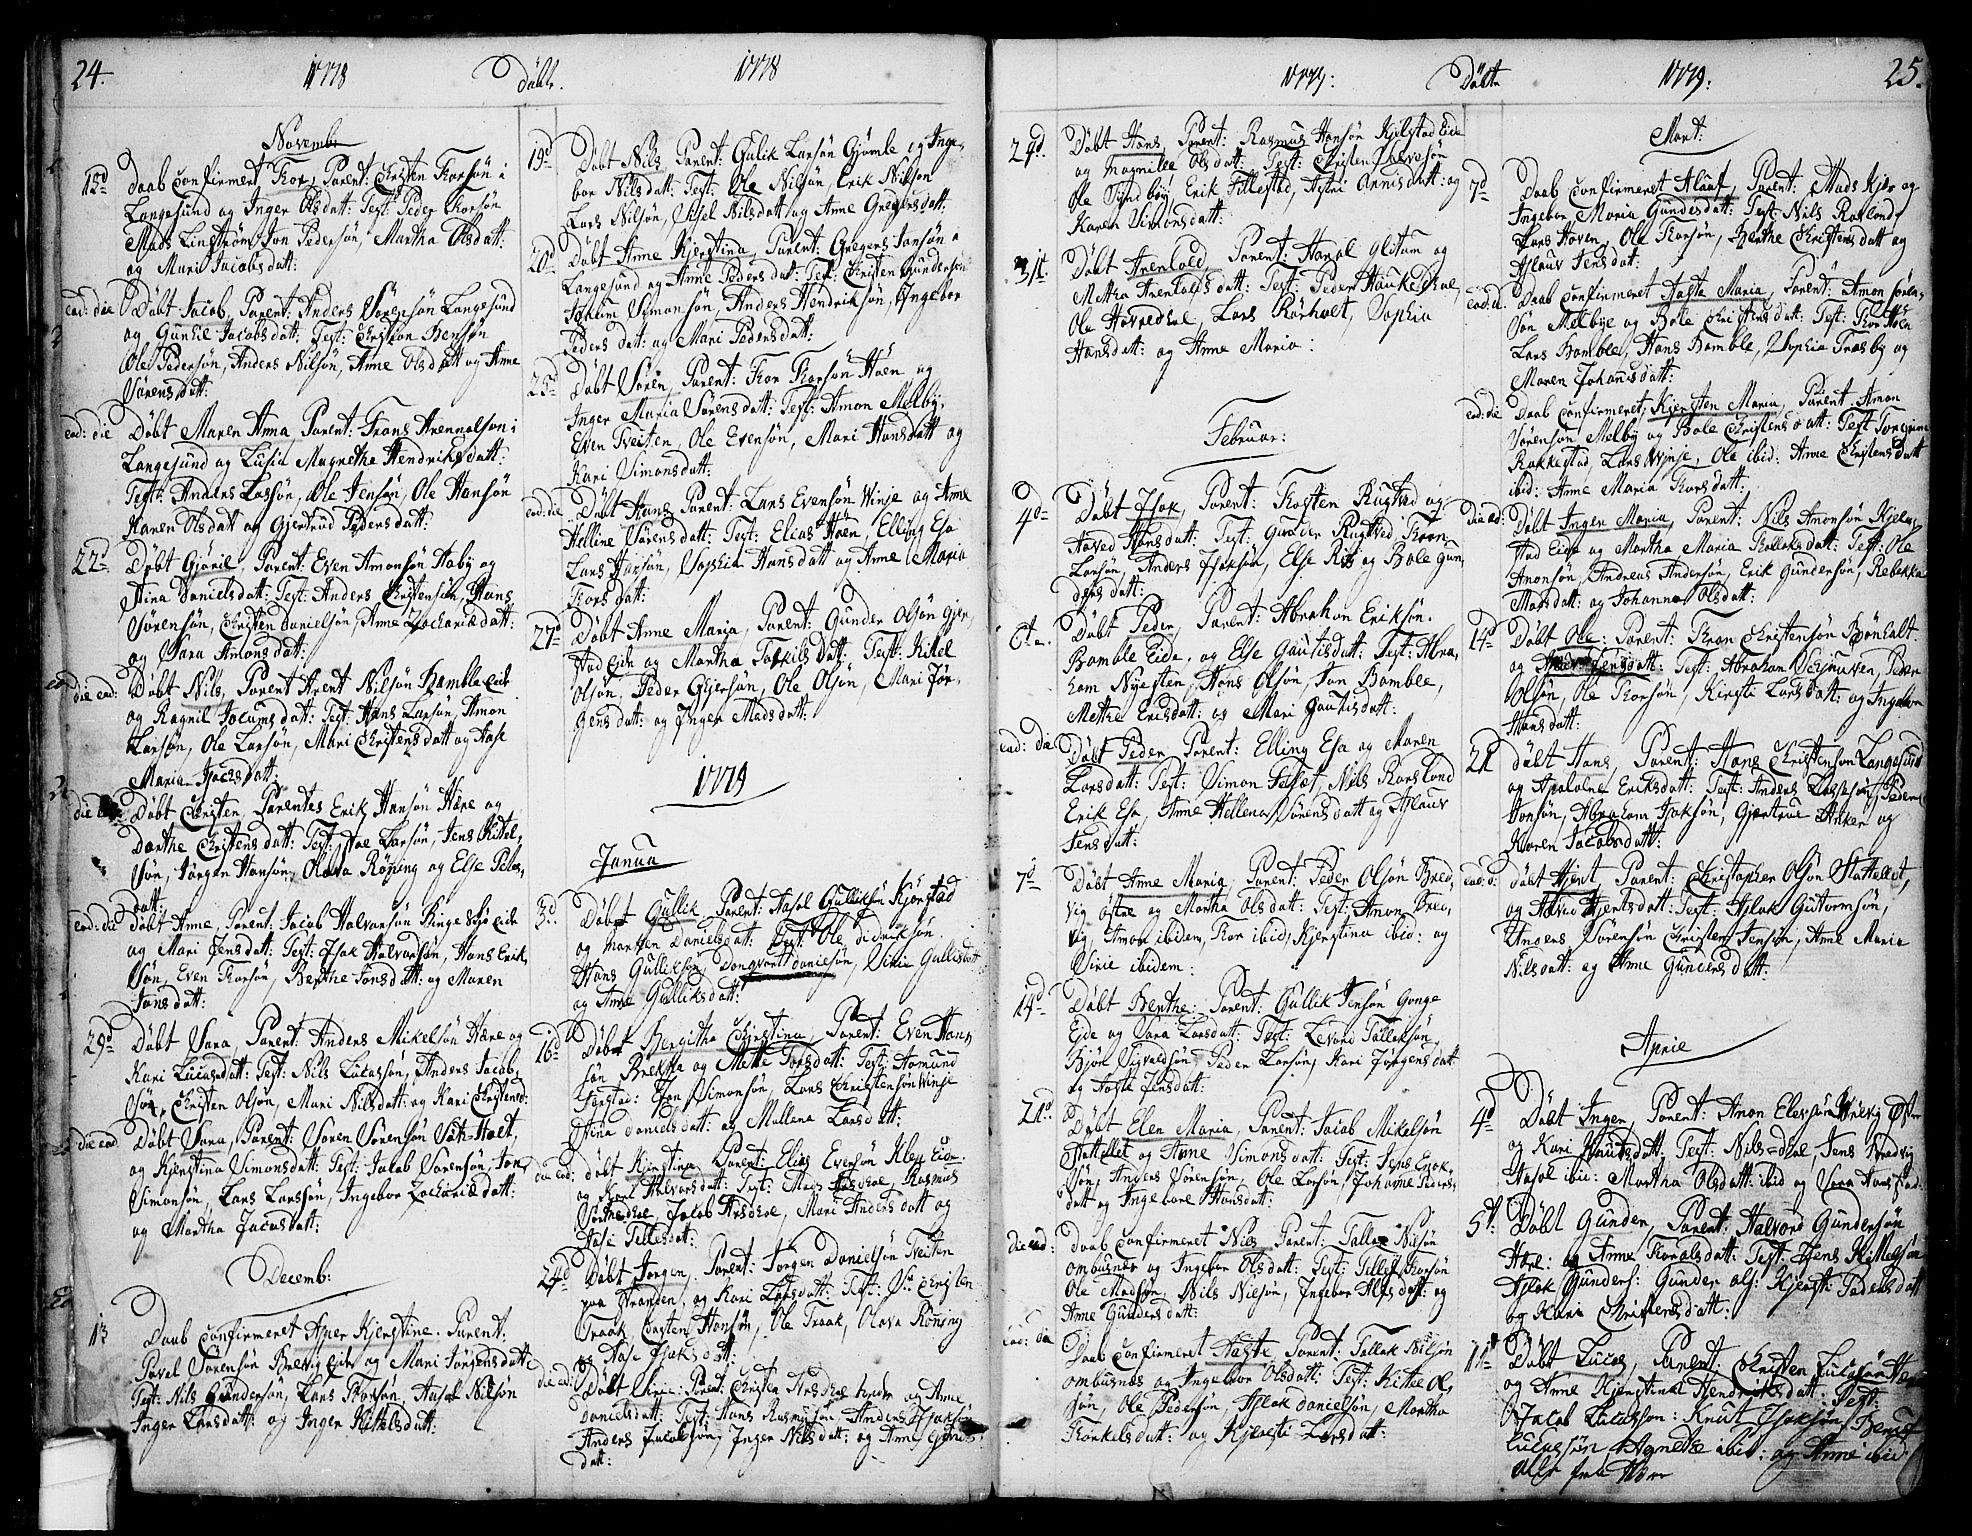 SAKO, Bamble kirkebøker, F/Fa/L0002: Ministerialbok nr. I 2, 1775-1814, s. 24-25